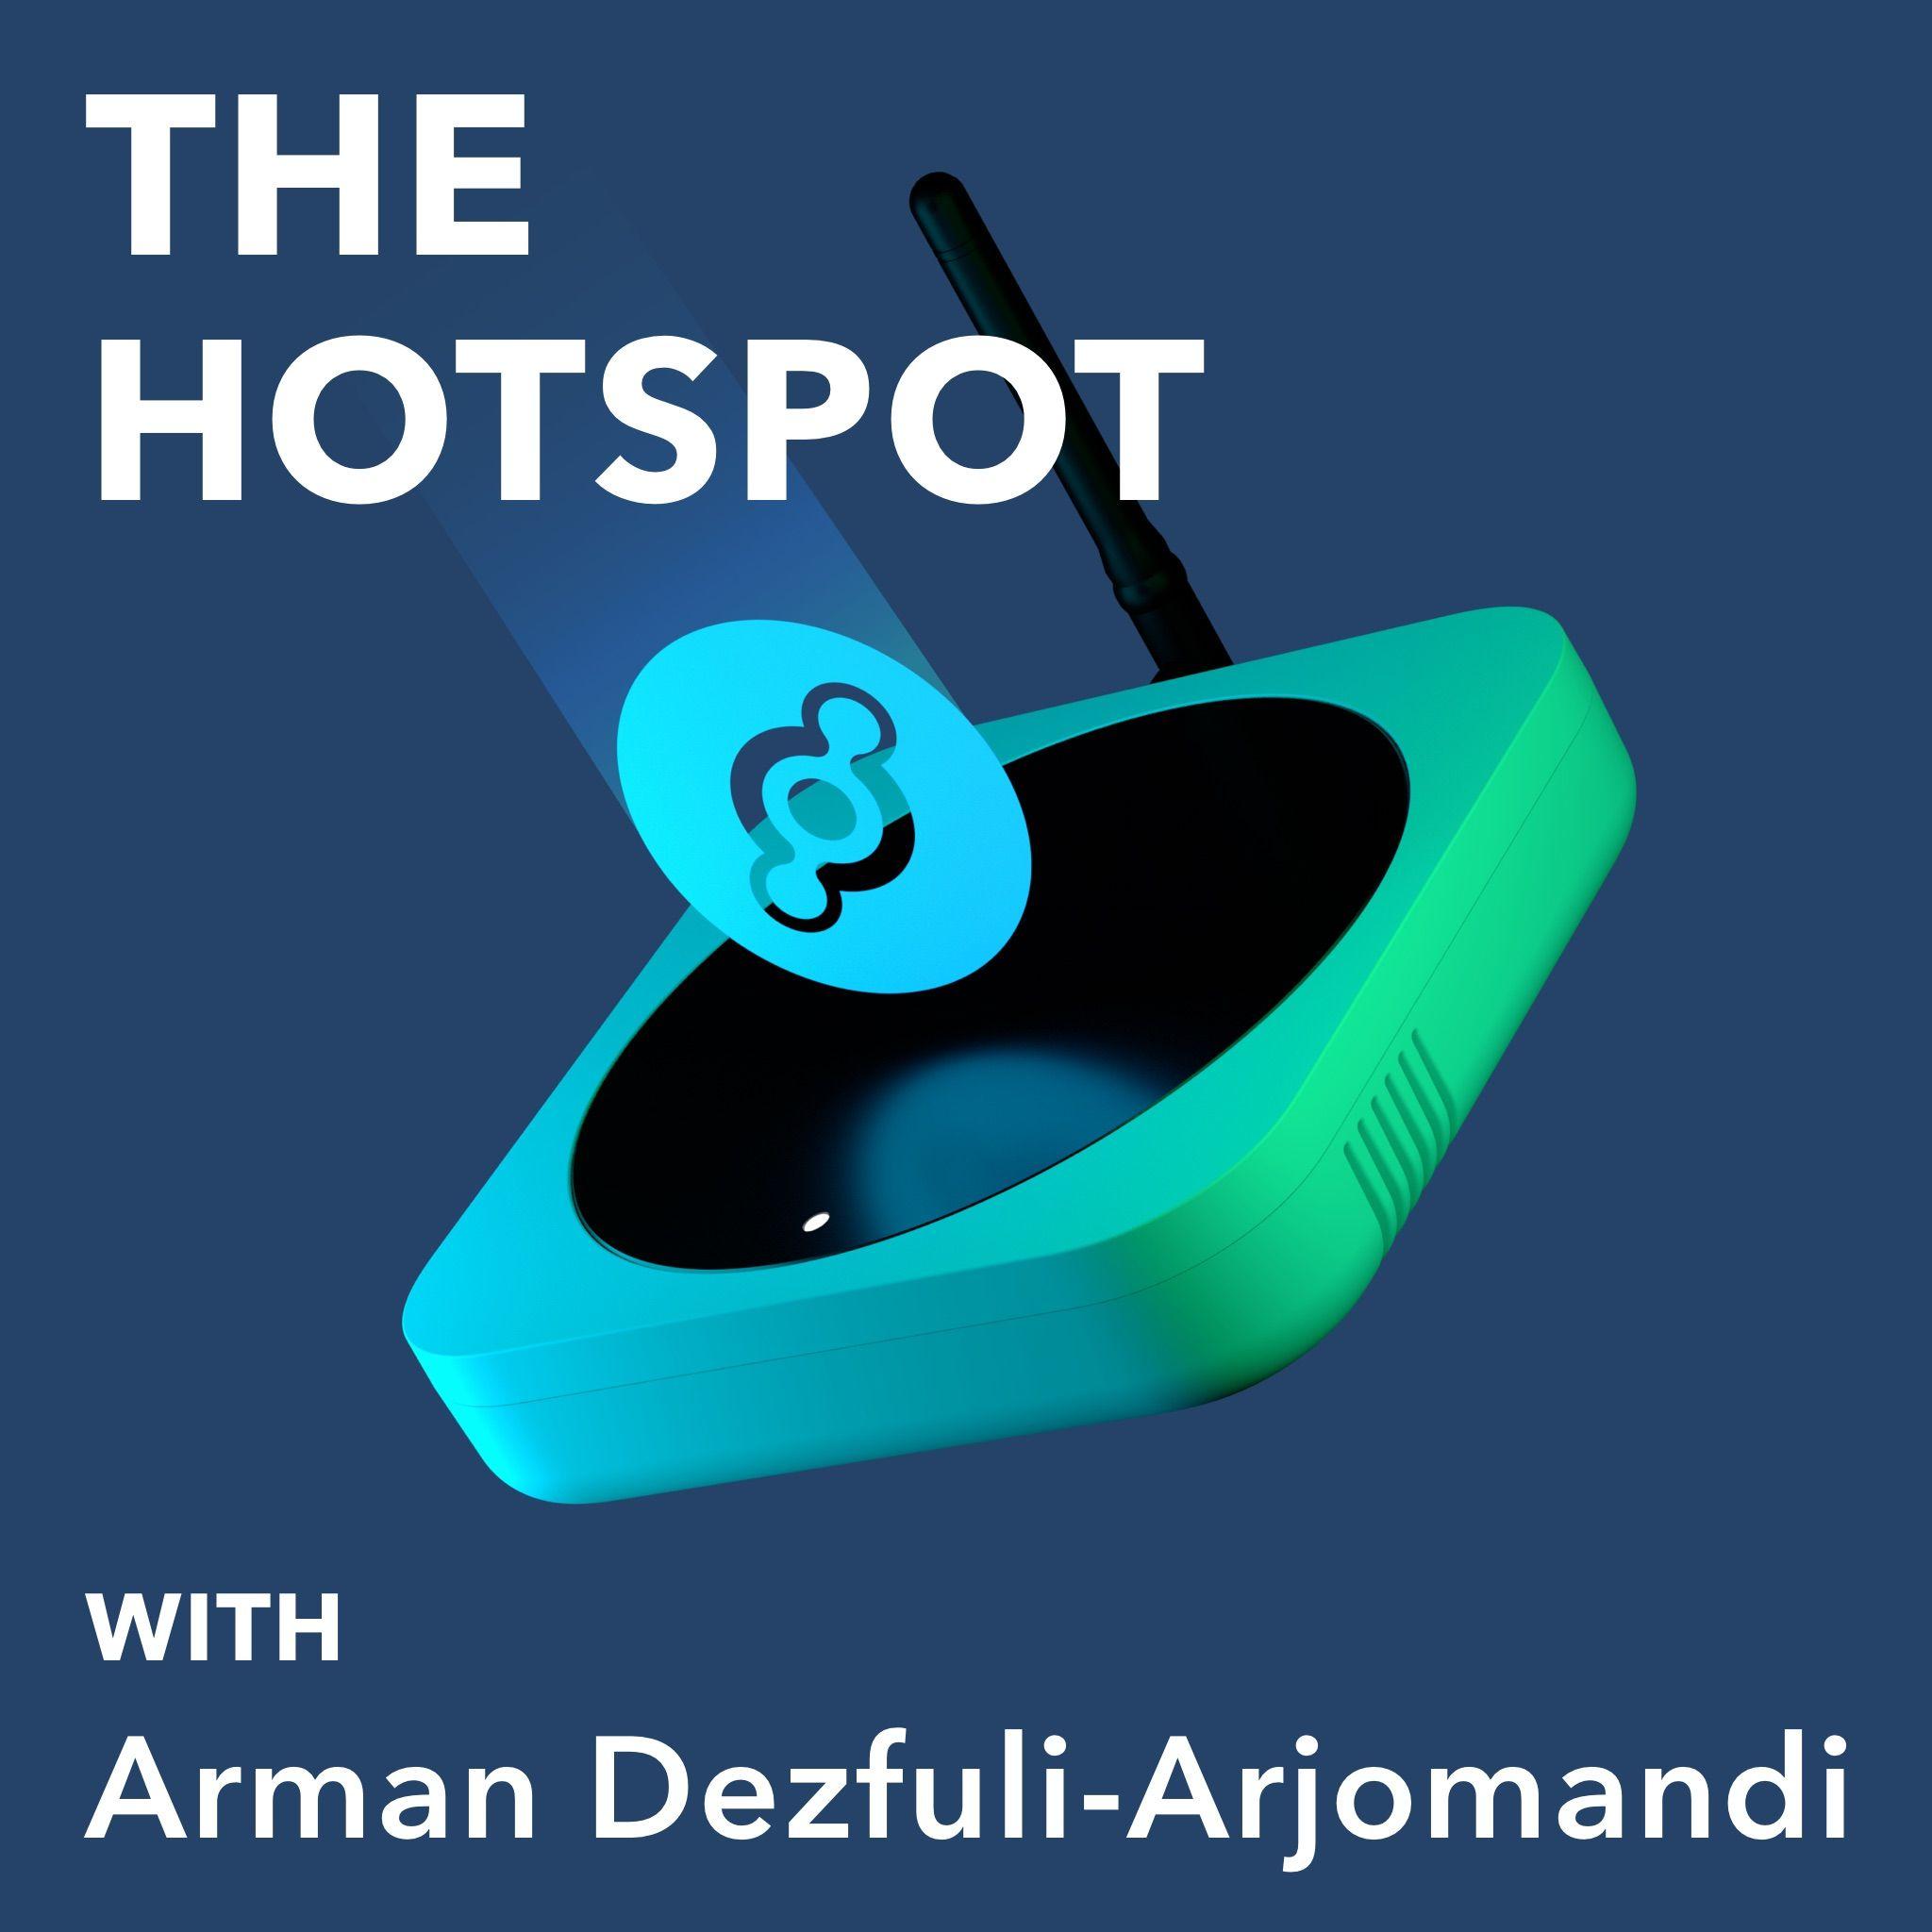 The Hotspot - Helium Network & Blockchain Podcast podcast show image